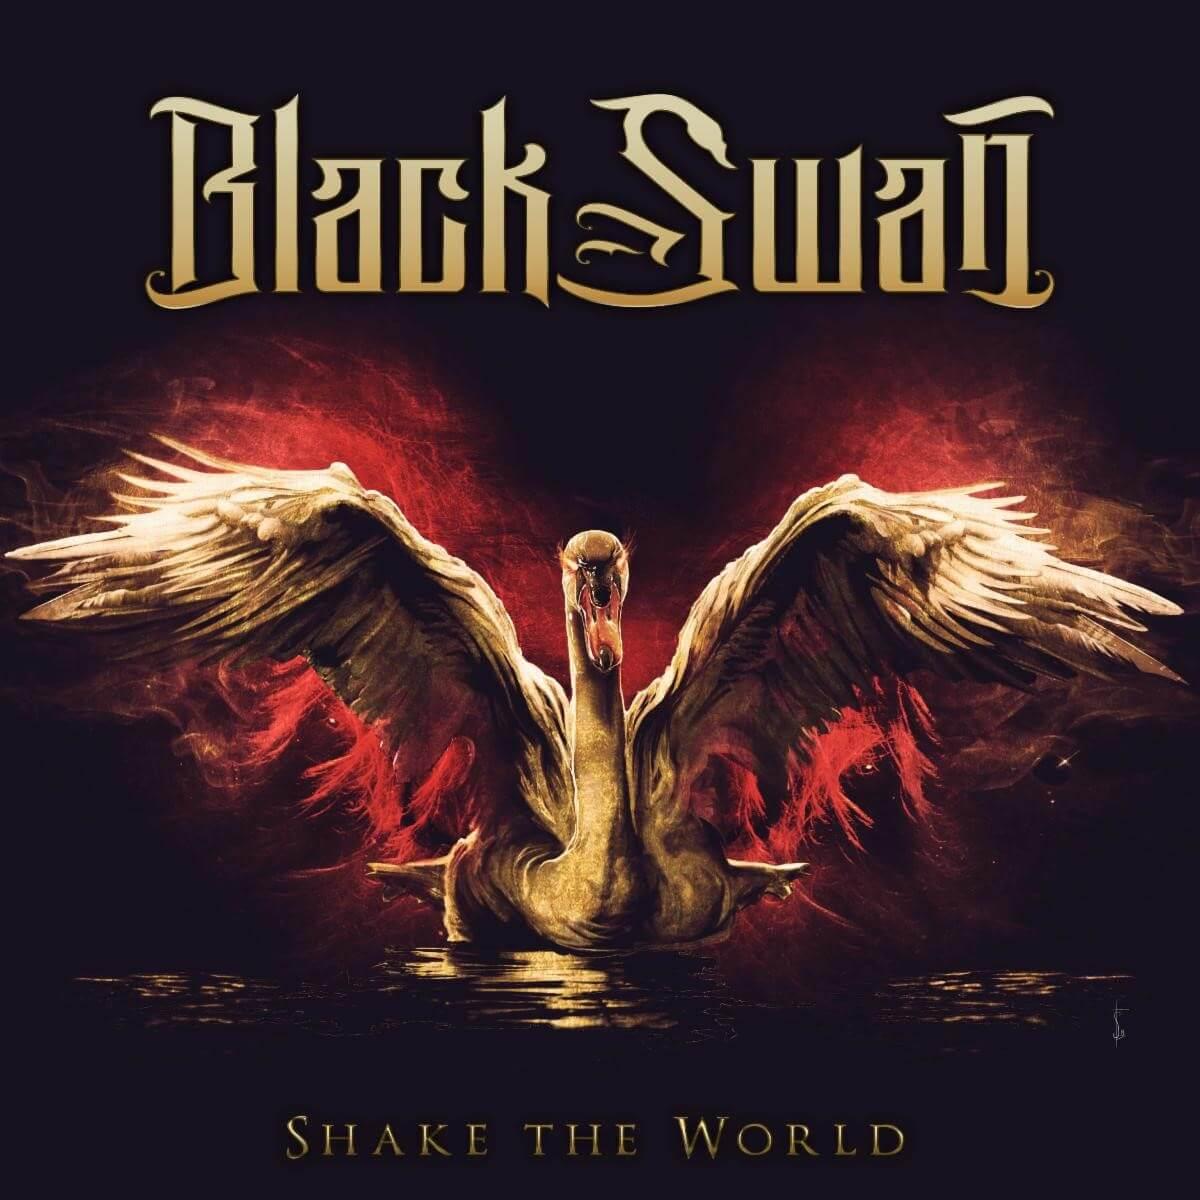 Black Swan Shake The World